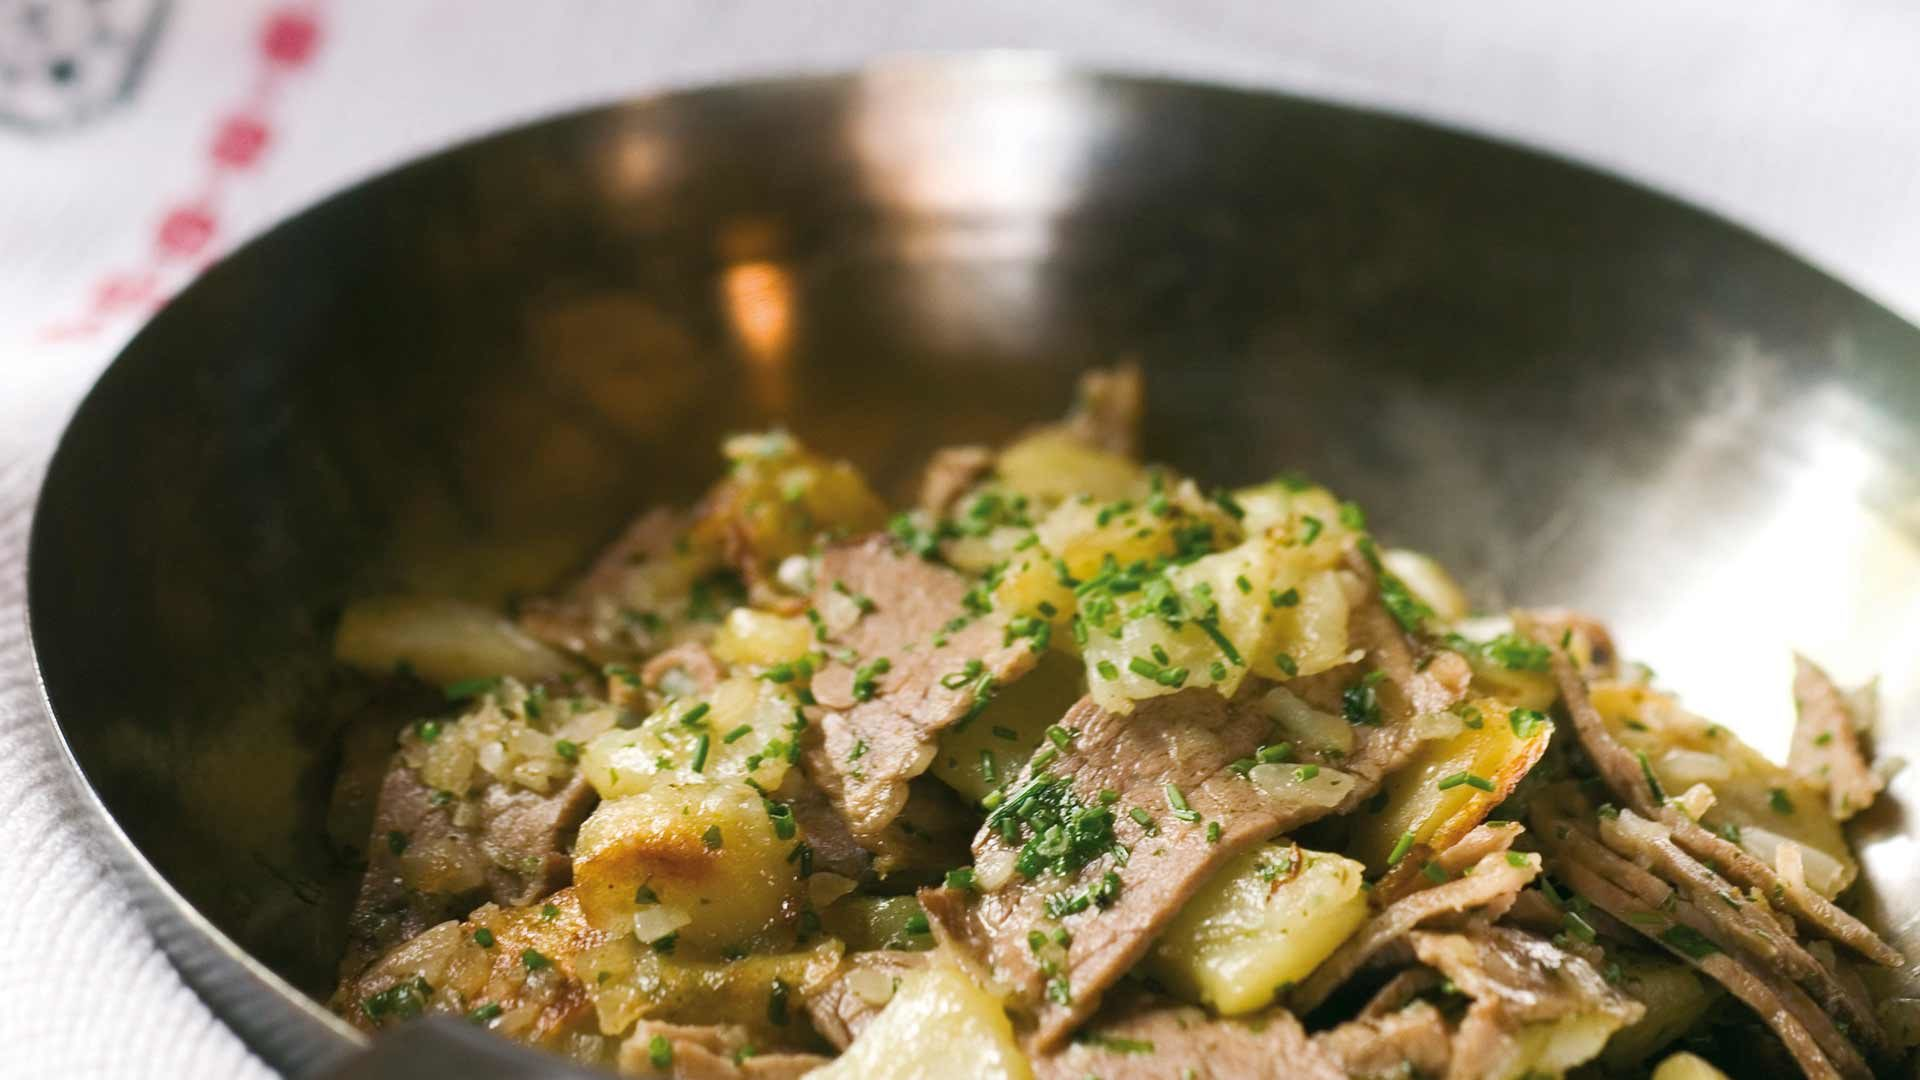 Cucina contadina - Alta Val Passiria